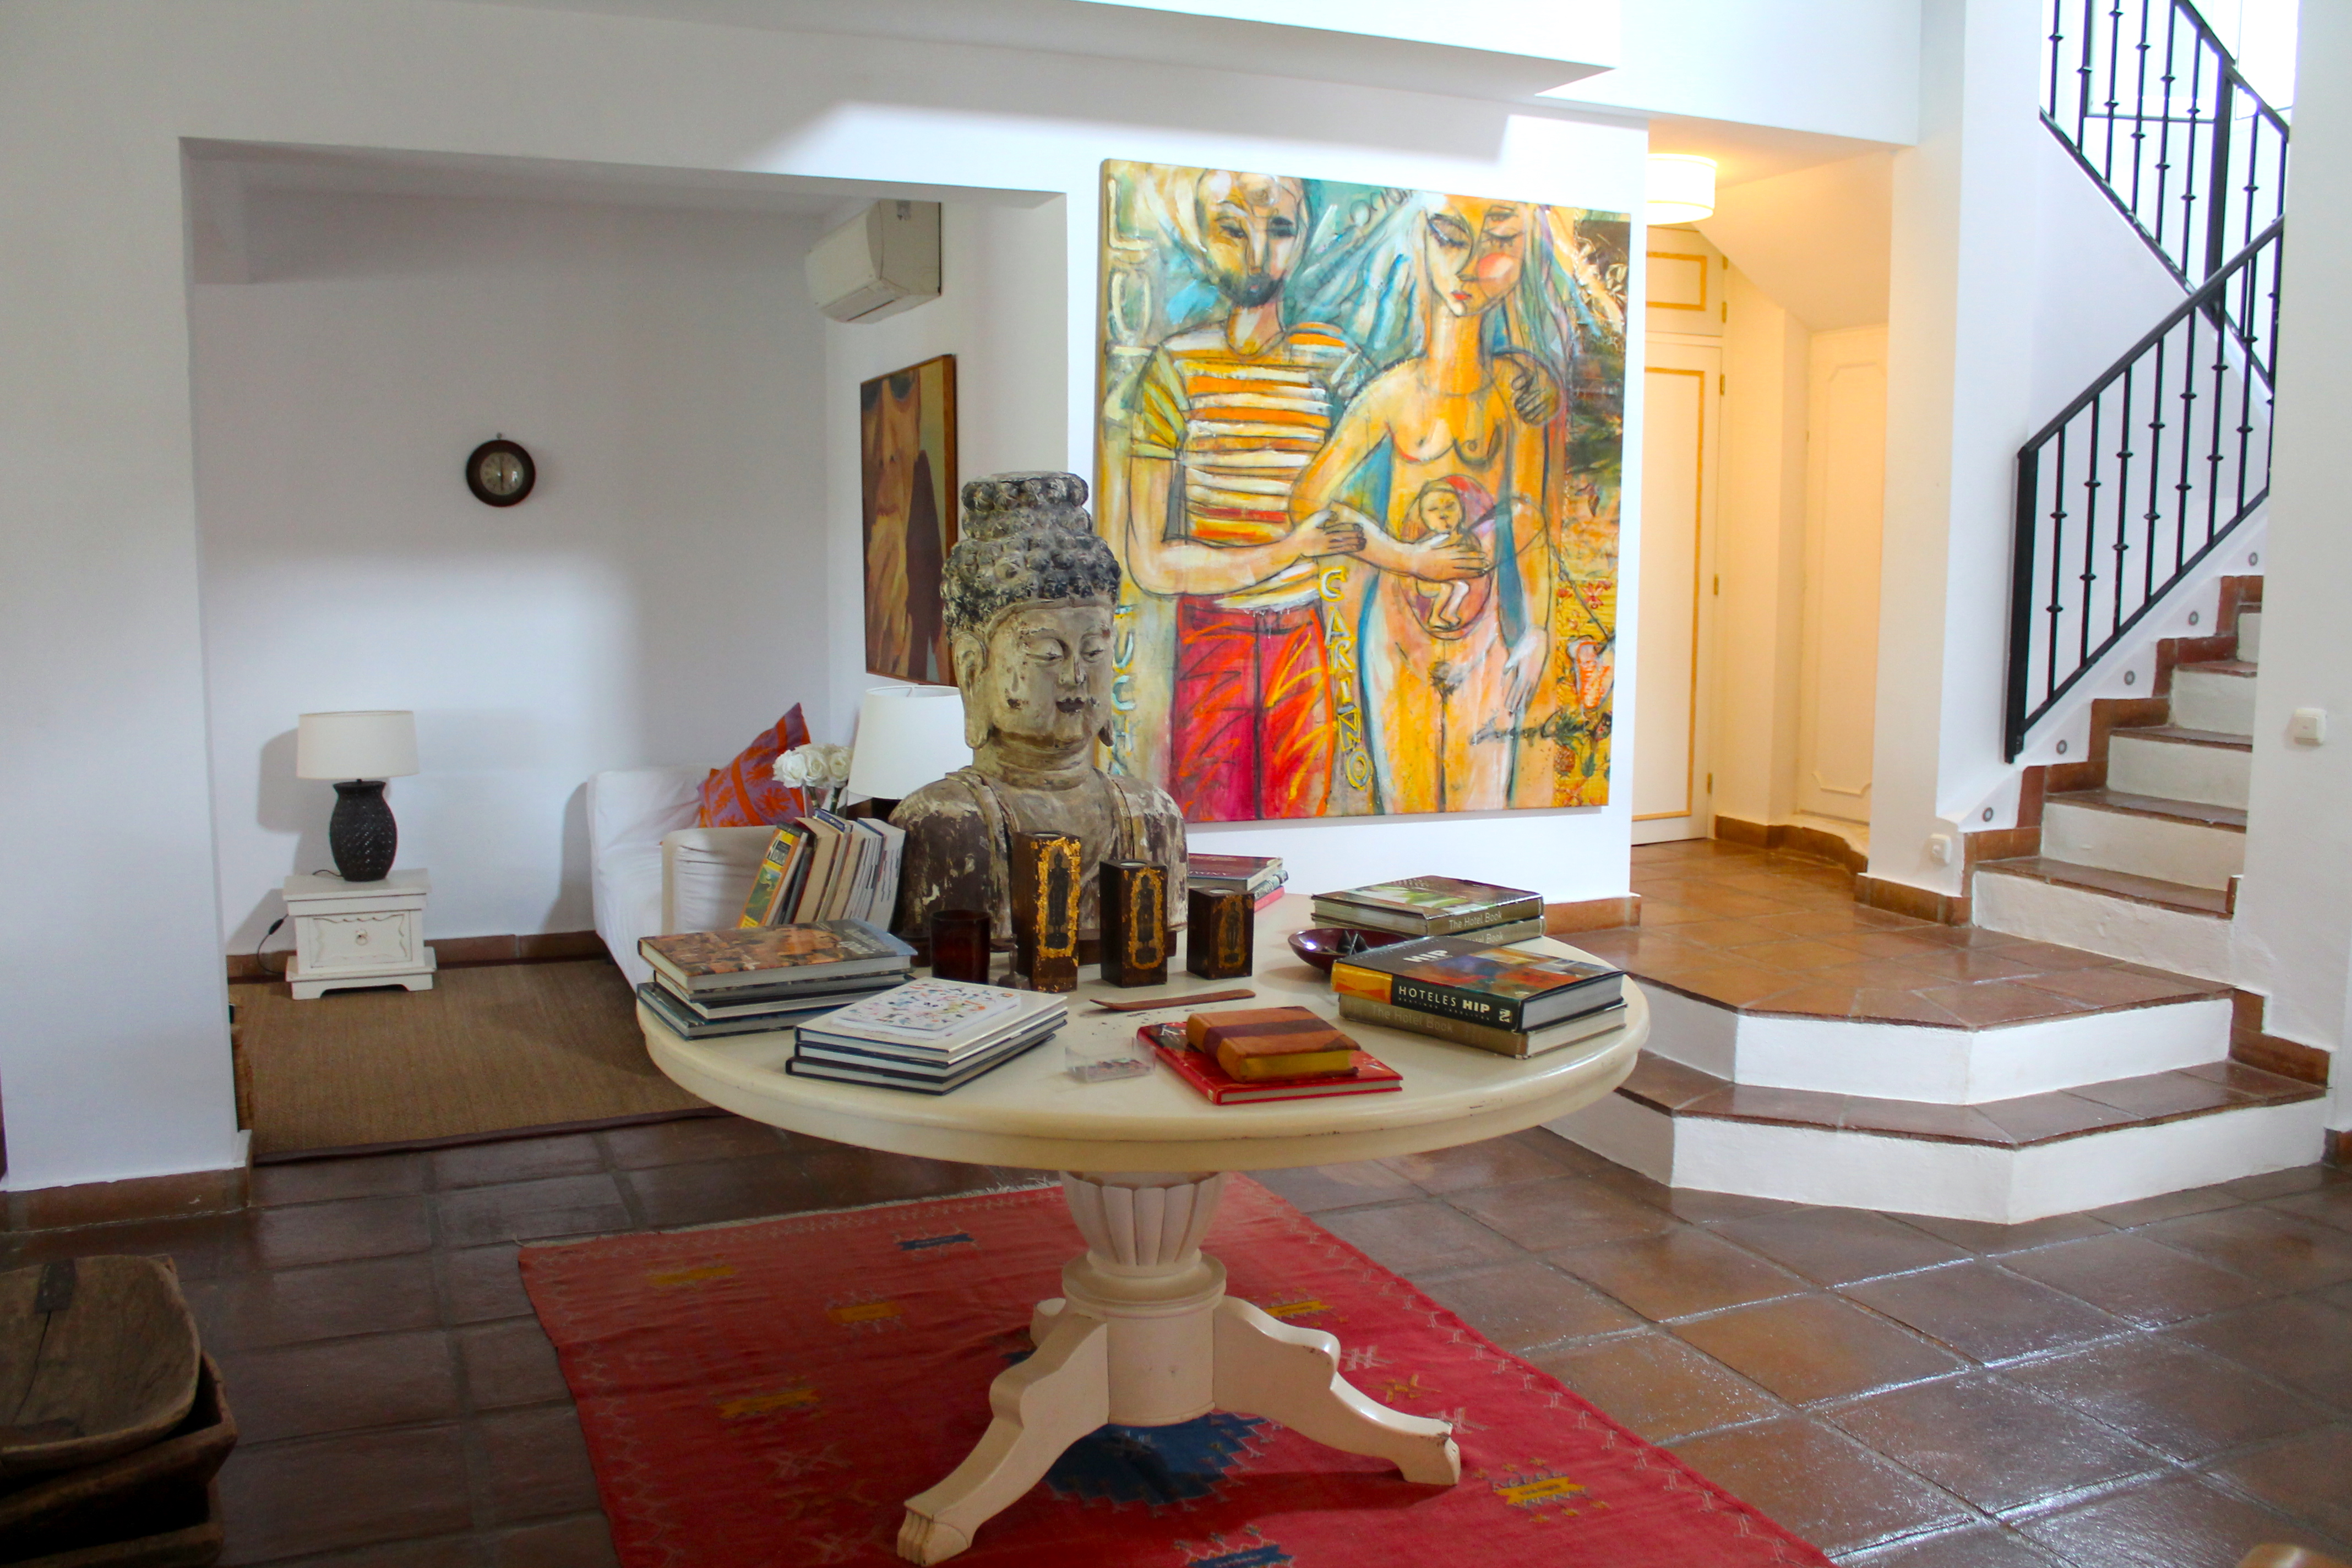 casalaconcha-interiors-marbella-spain